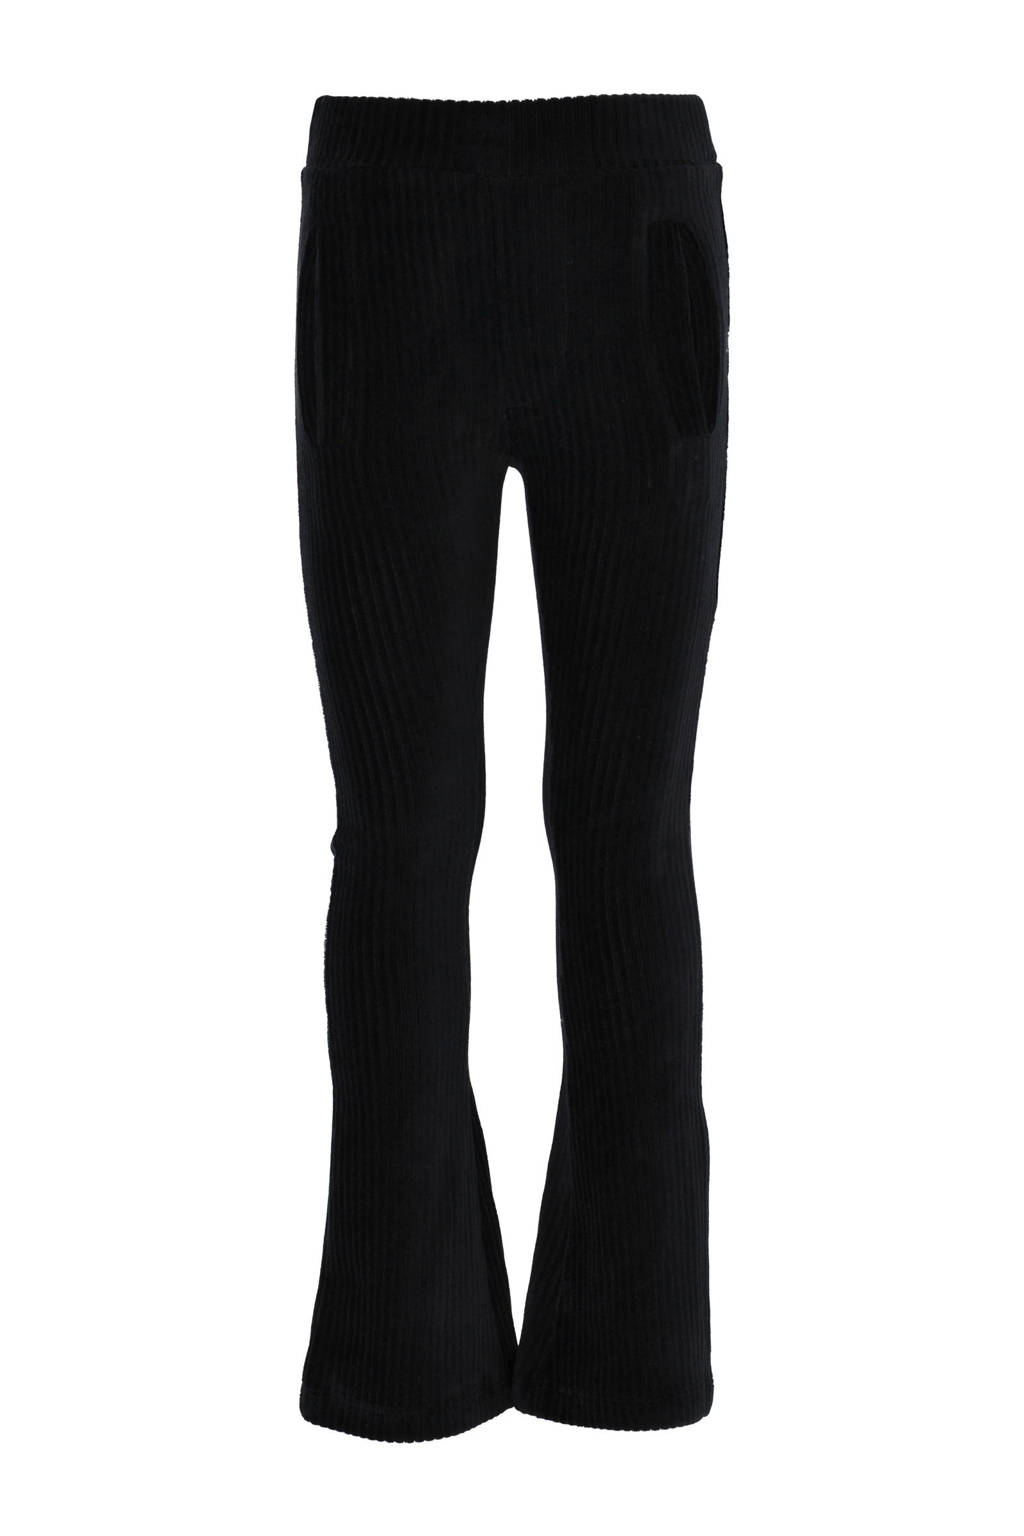 KIDDO corduroy flared broek Erna zwart, Zwart